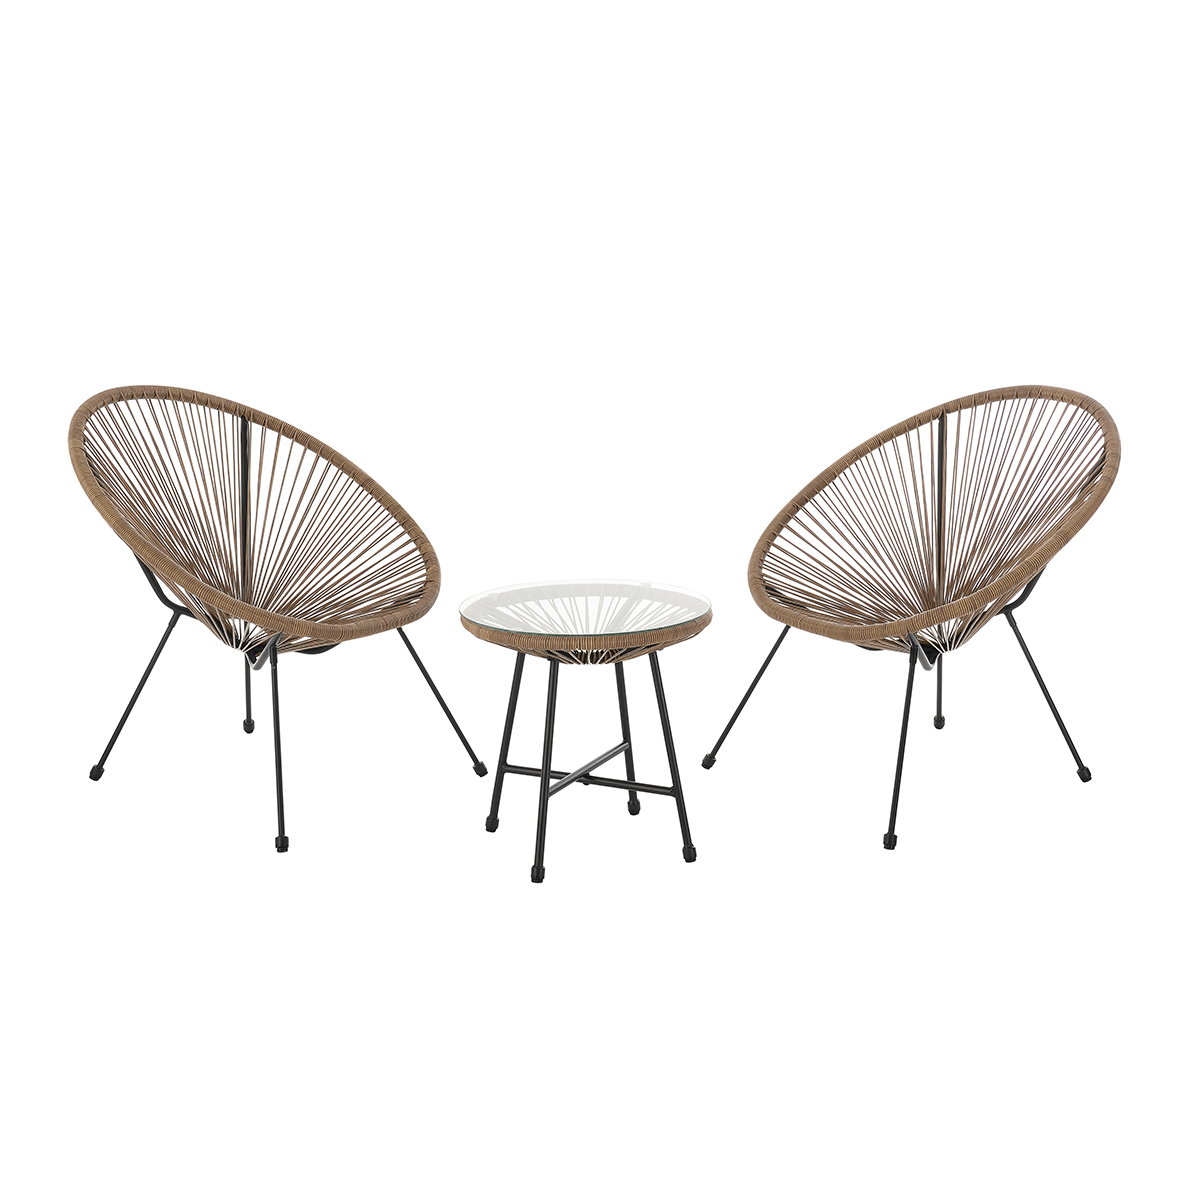 92257 SVITA BALI Balkon-Möbel 3-tlg. Polyrattan Lounge-Set Balkon-Set Braun